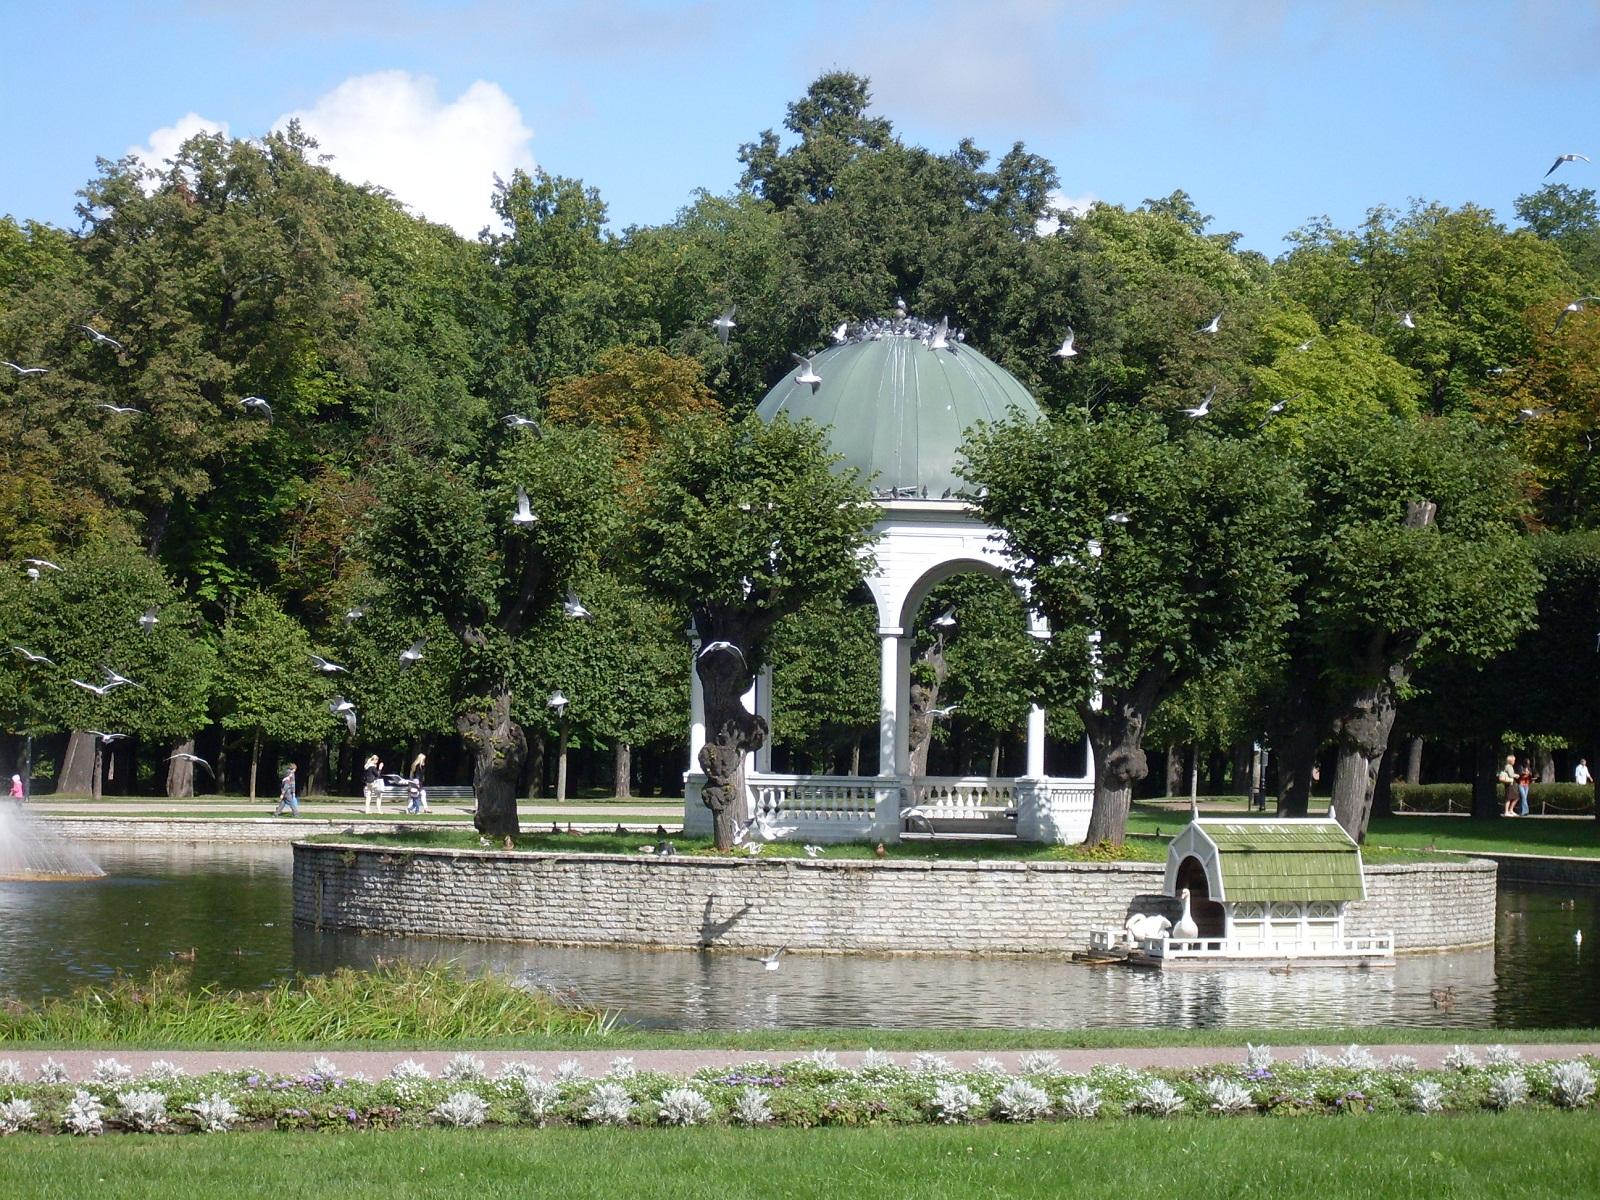 Tallinn, Estonia, Gazebo in Kadriorg park